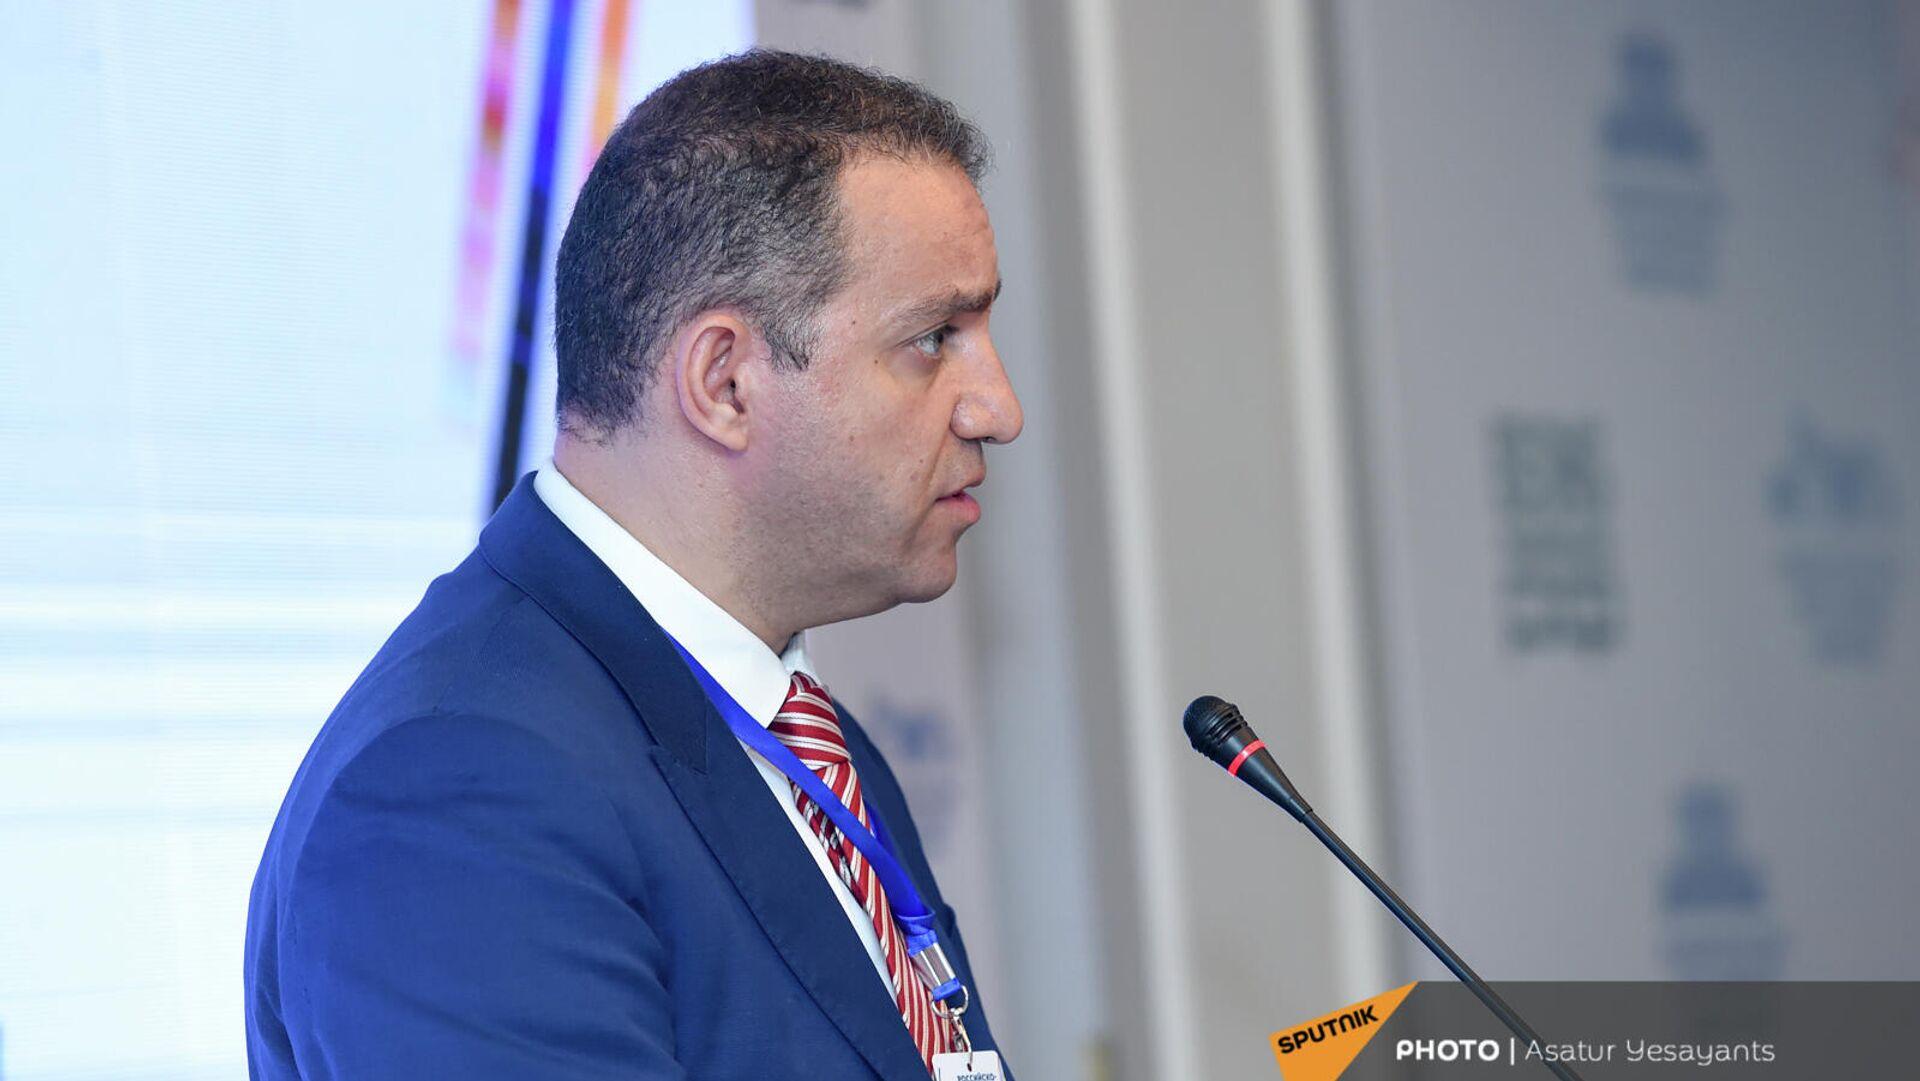 Министр экономики Ваган Керобян на бизнес-форуме Armenian Business Forum (ABF) 2021 ассоциации армянских предпринимателей (20 сентября 2021). Ереван - Sputnik Армения, 1920, 20.09.2021